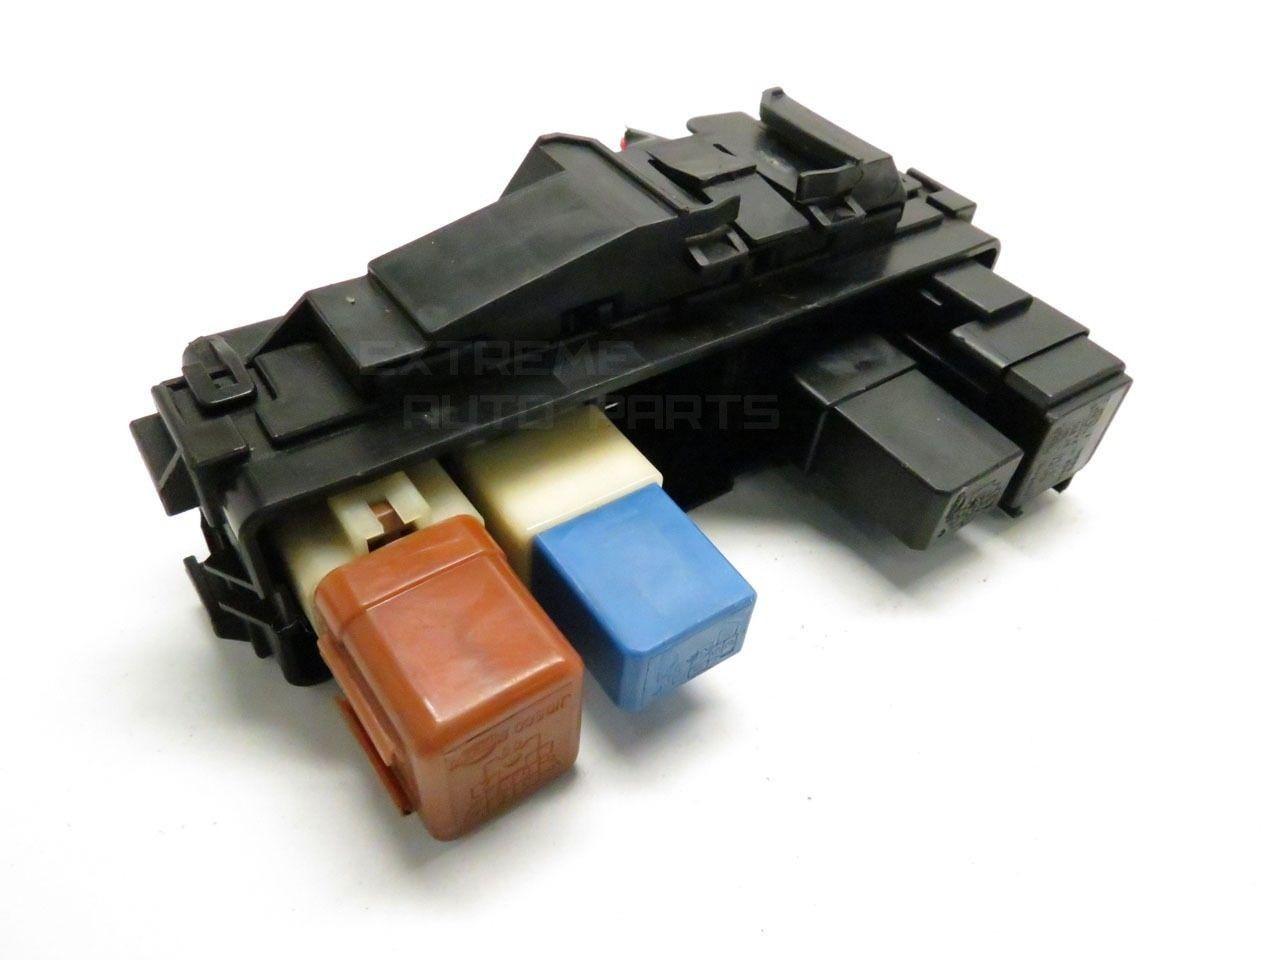 06 infiniti m35 fuse box infiniti m35 fuse box location infiniti m35 06-07 under hood relay fuse box rail unit ...